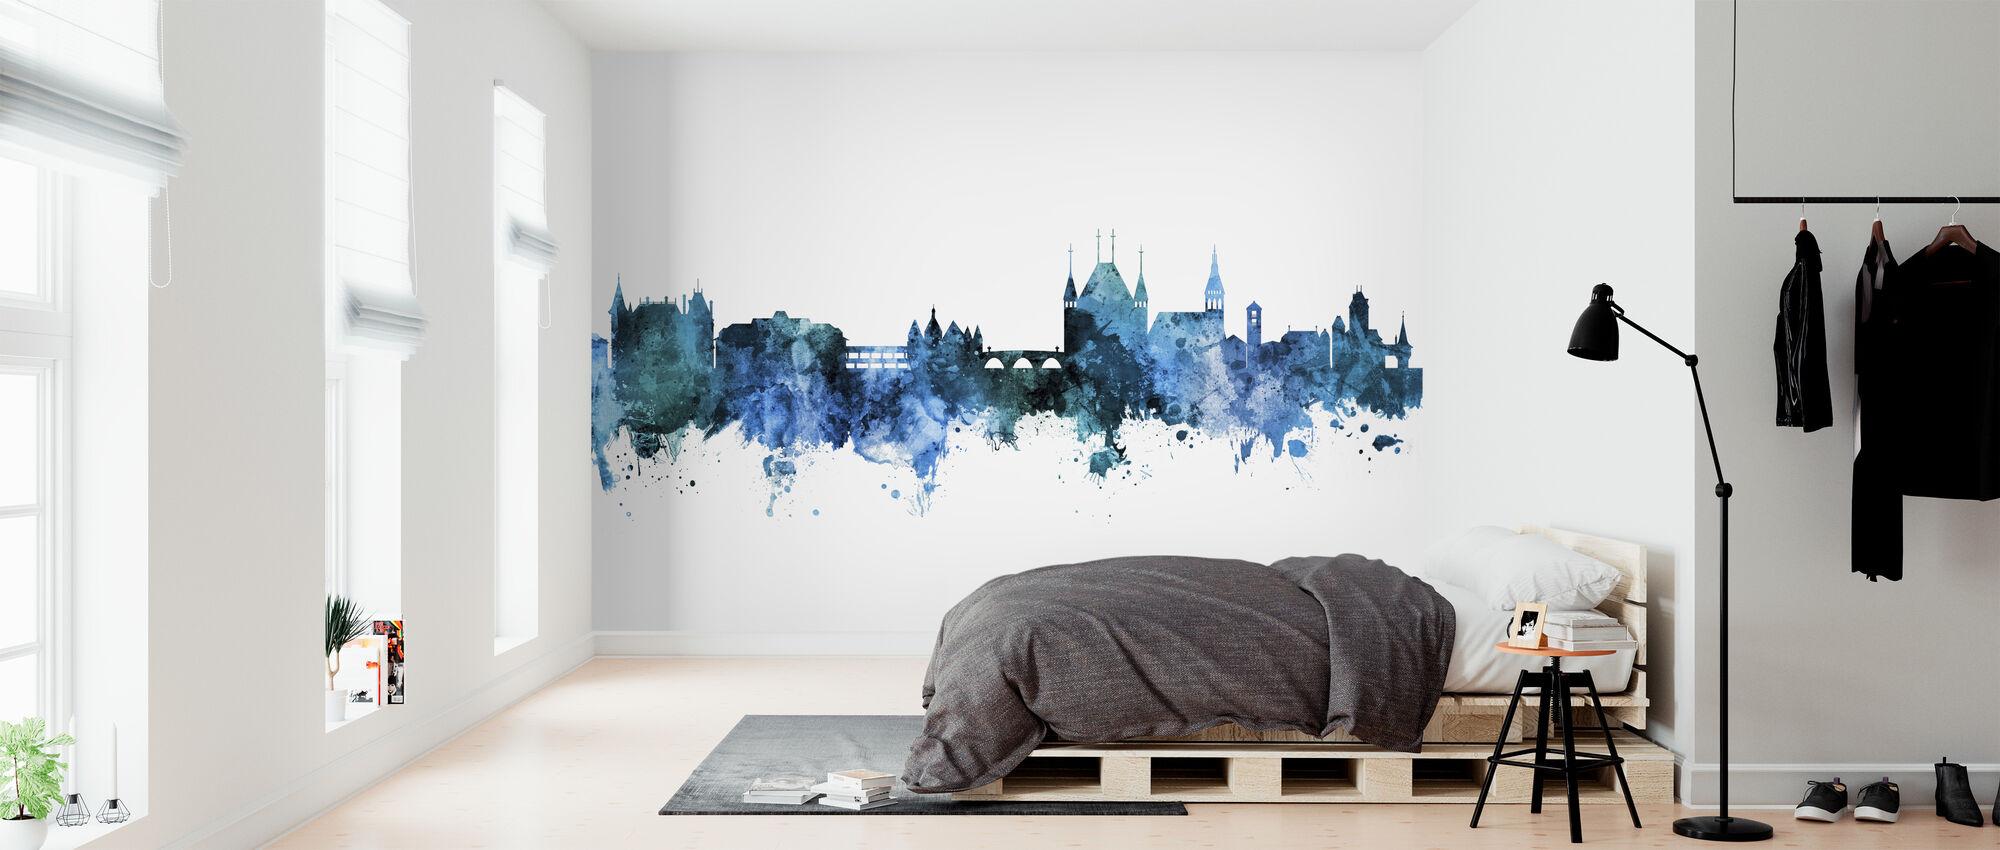 Thun Switzerland Skyline - Wallpaper - Bedroom